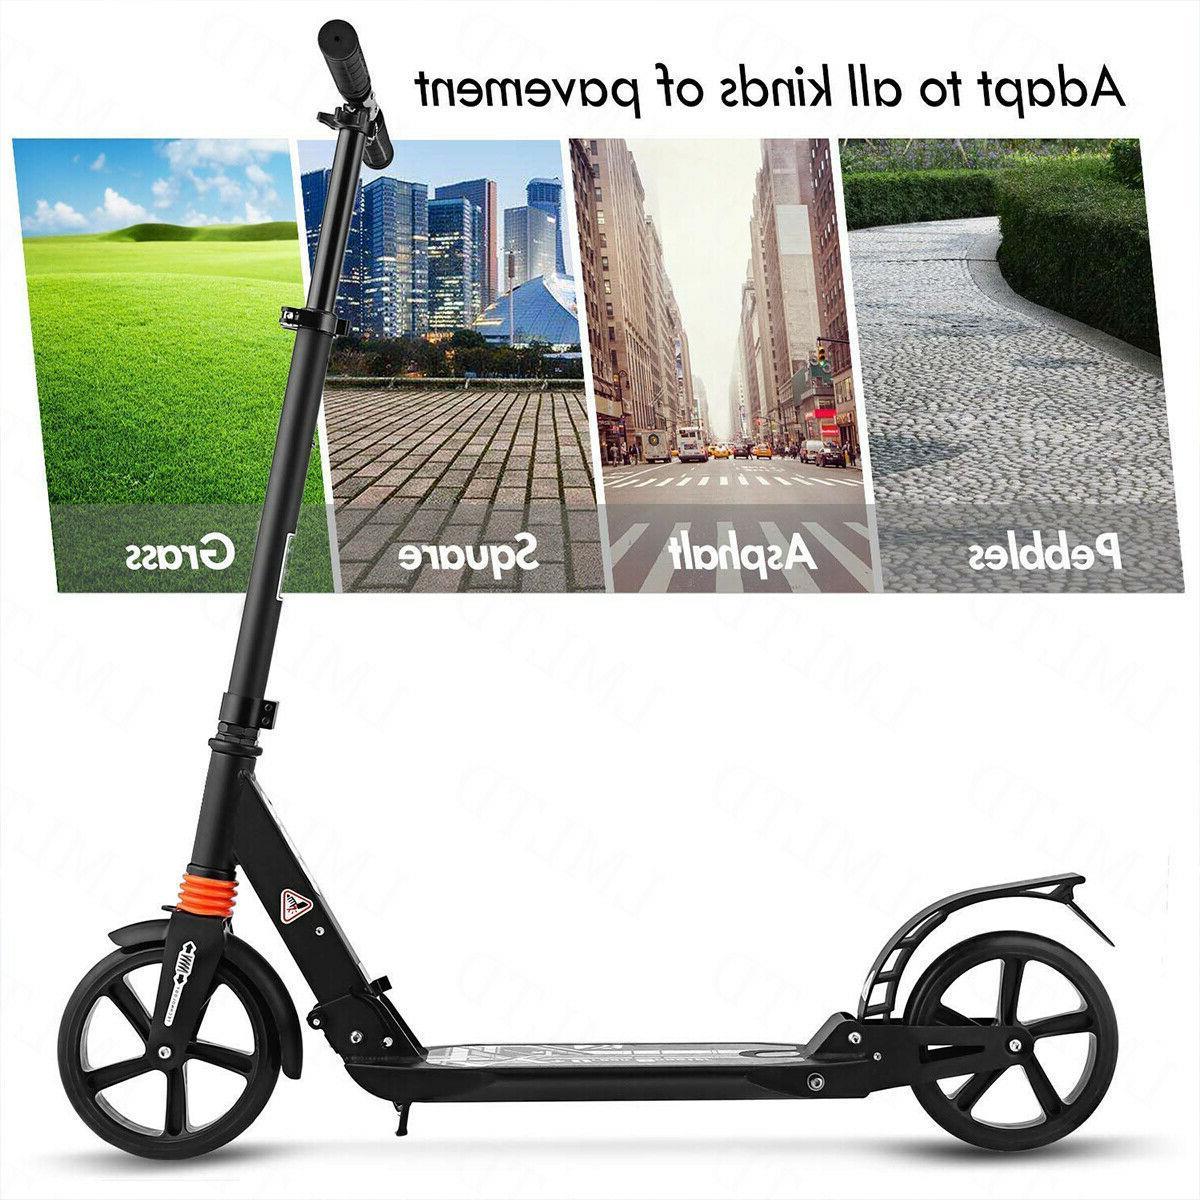 ANCHEER Kid Scooter Kick Adjustable Height Wheels